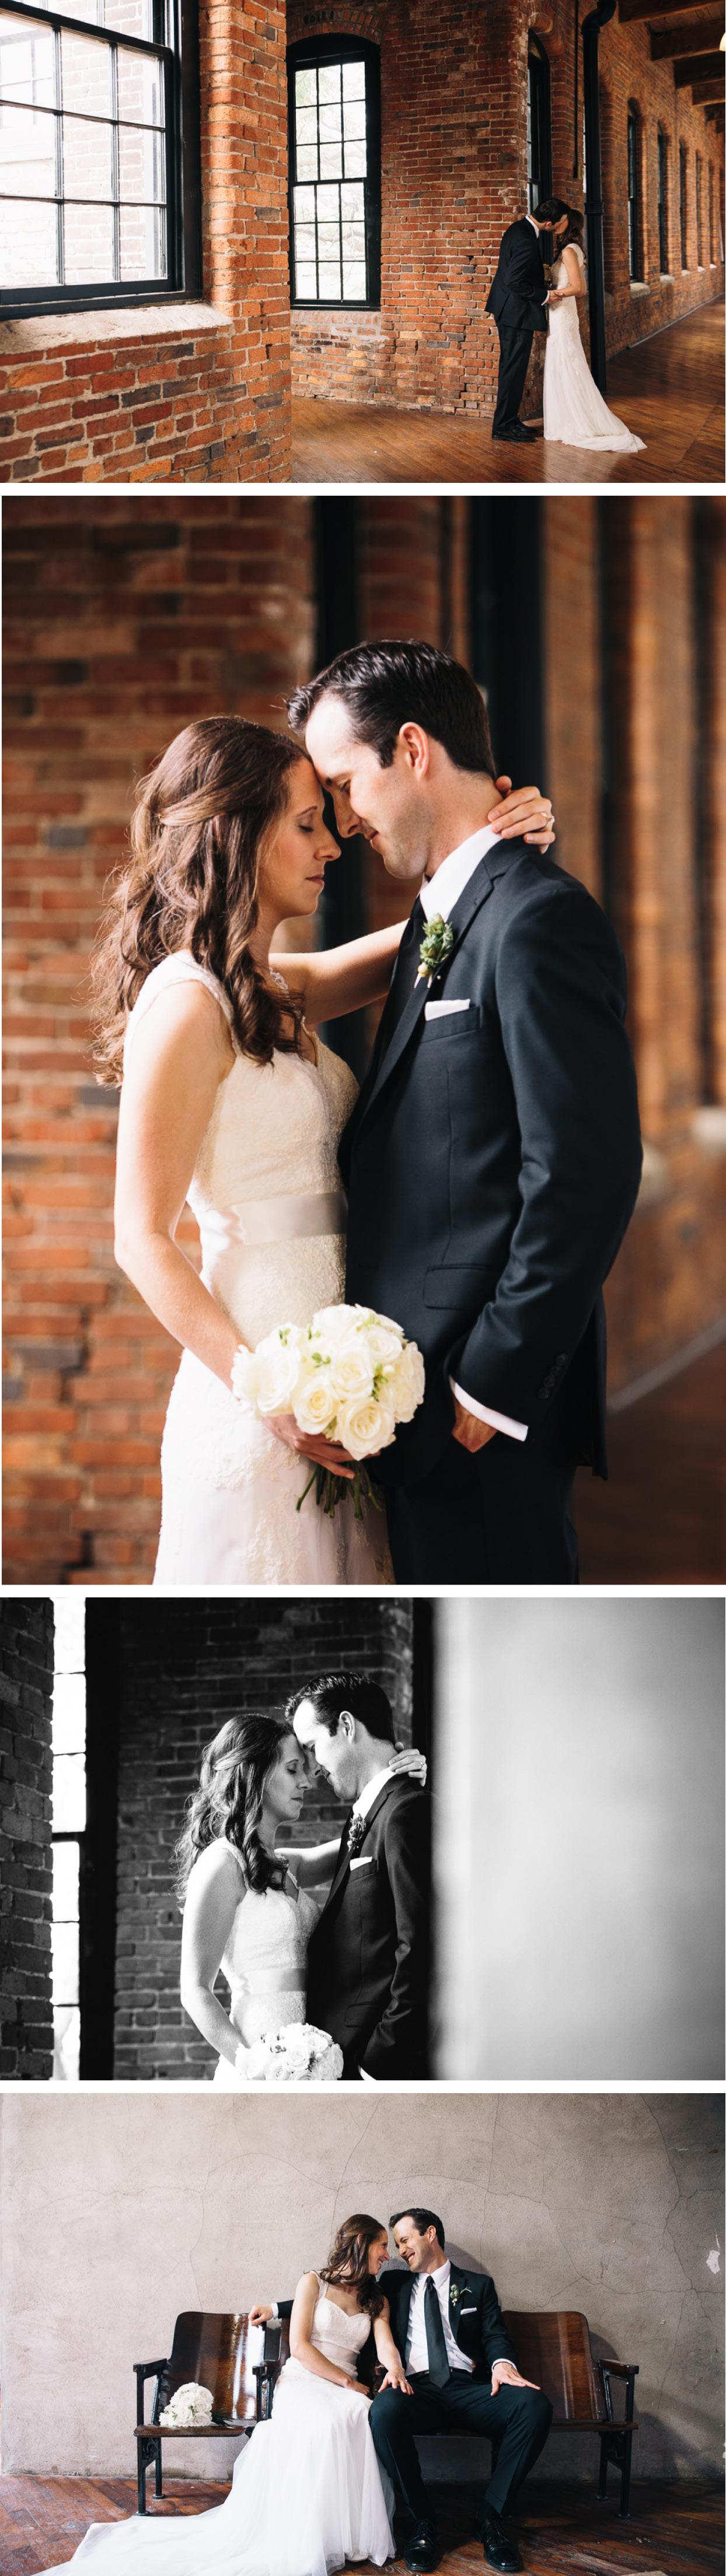 CK-Photo-Nashville-Wedding-Photographer-mh2.jpg